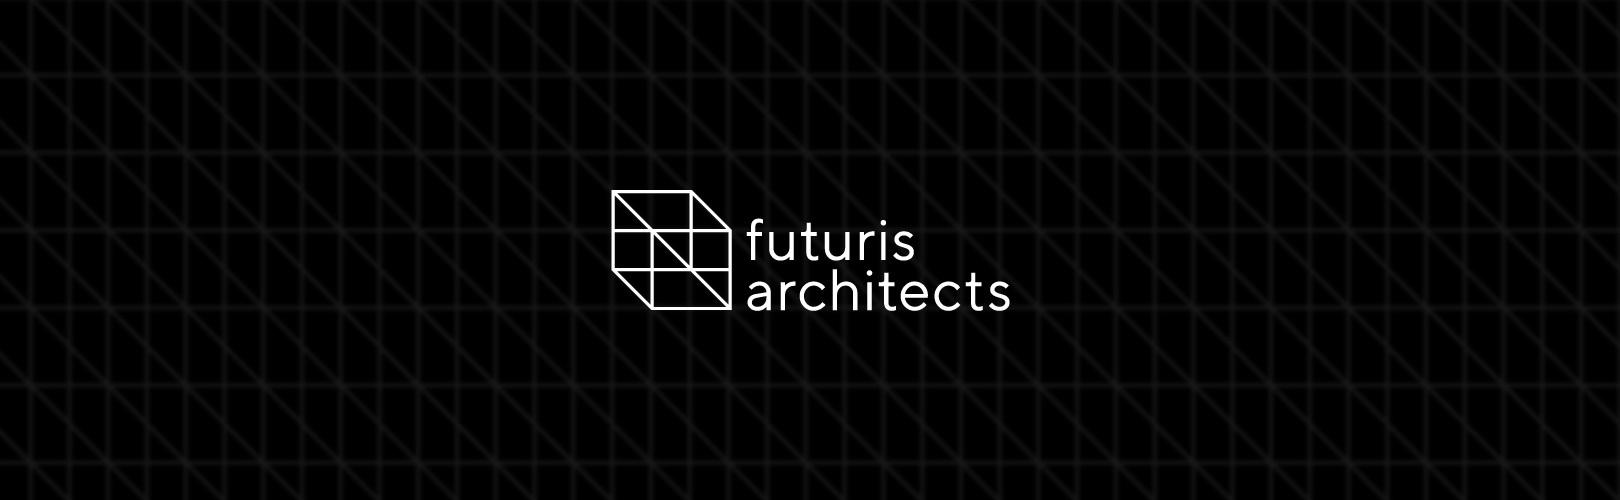 logo design architectural branding mockup futuris architects interior design